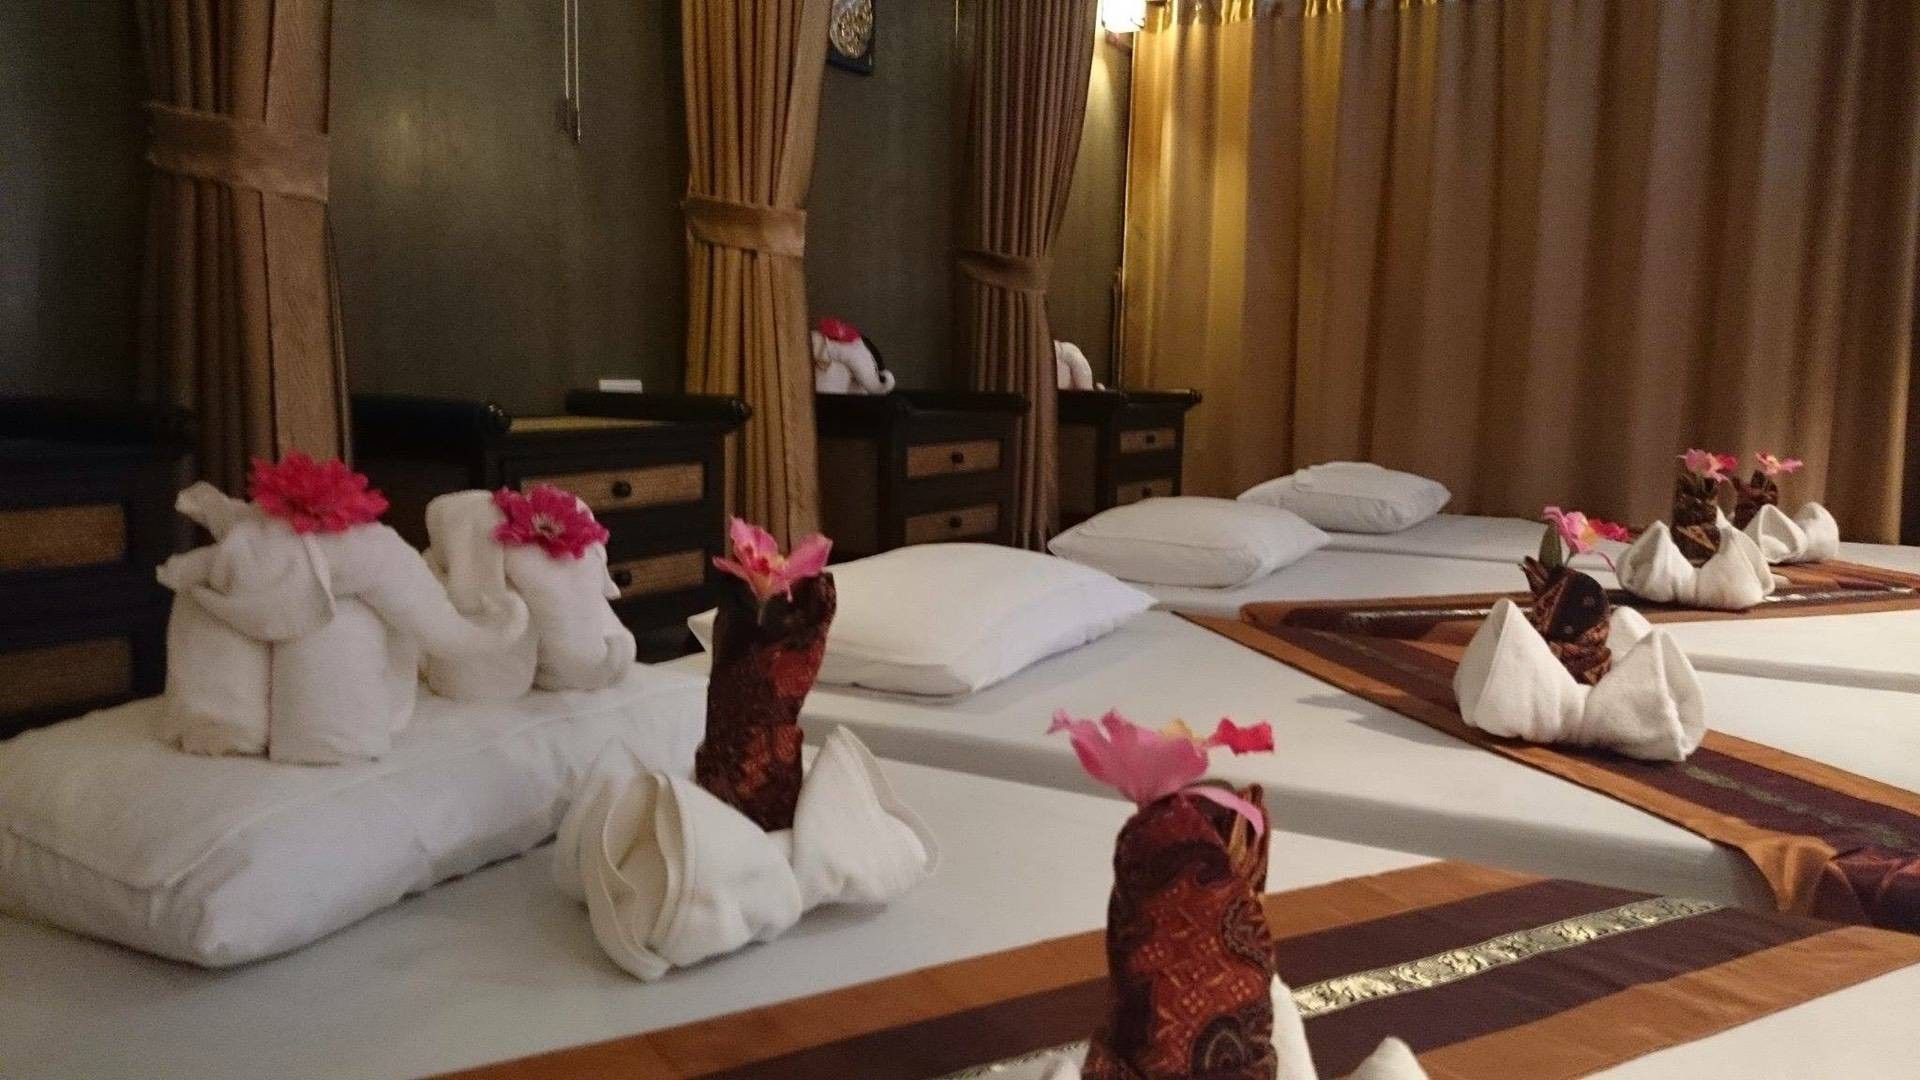 Cloud9 Massage And Spa